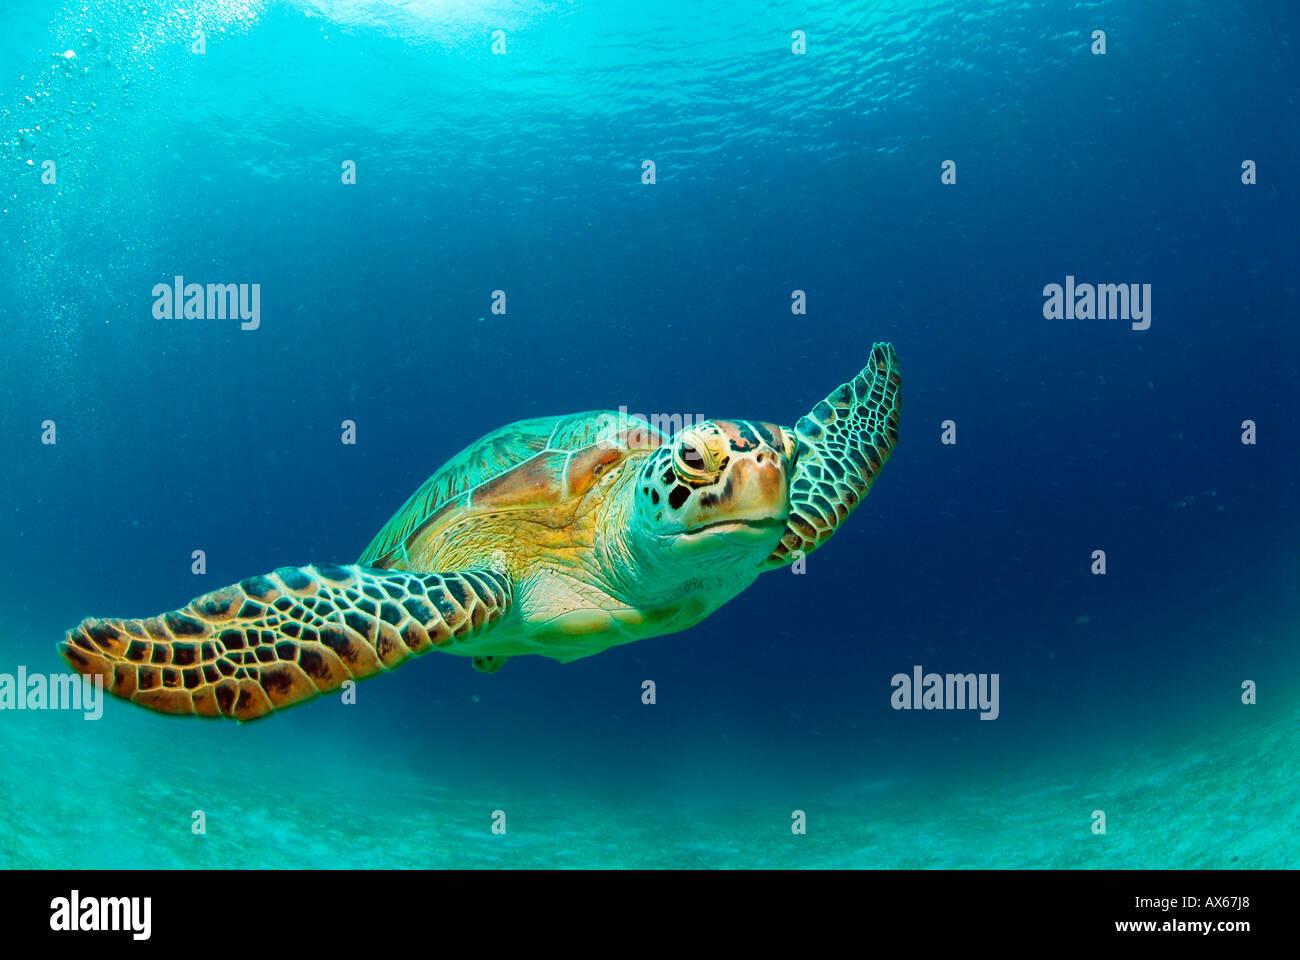 Philippines, green sea turtle (Chelonia mydas) swimming - Stock Image